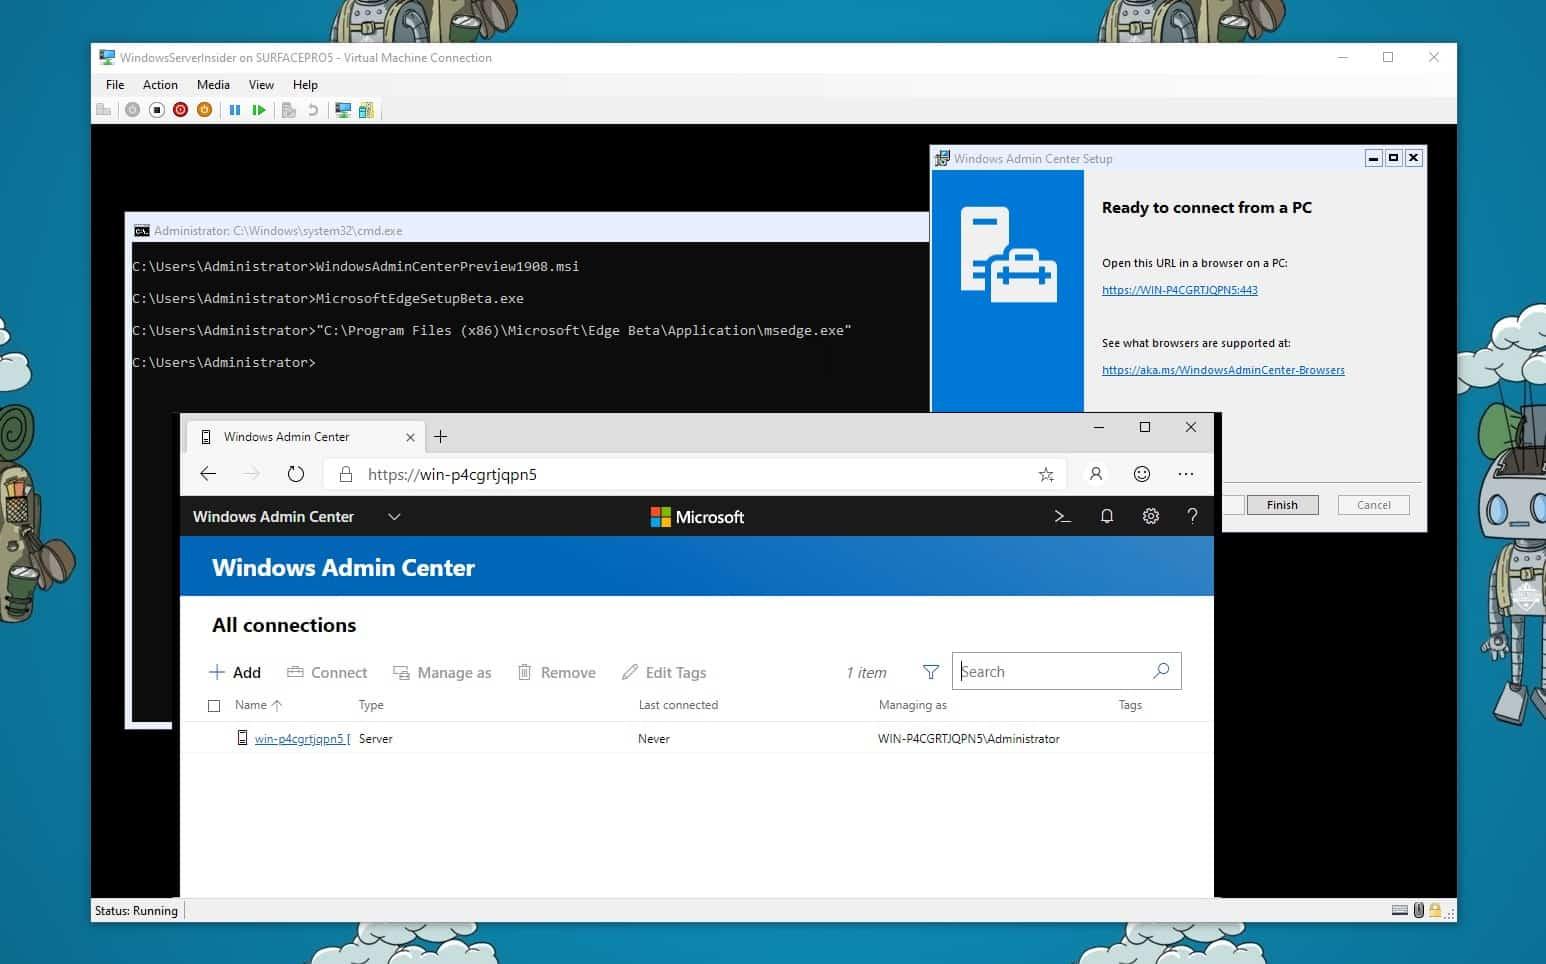 Run Windows Admin Center on Windows Server Core - Thomas Maurer